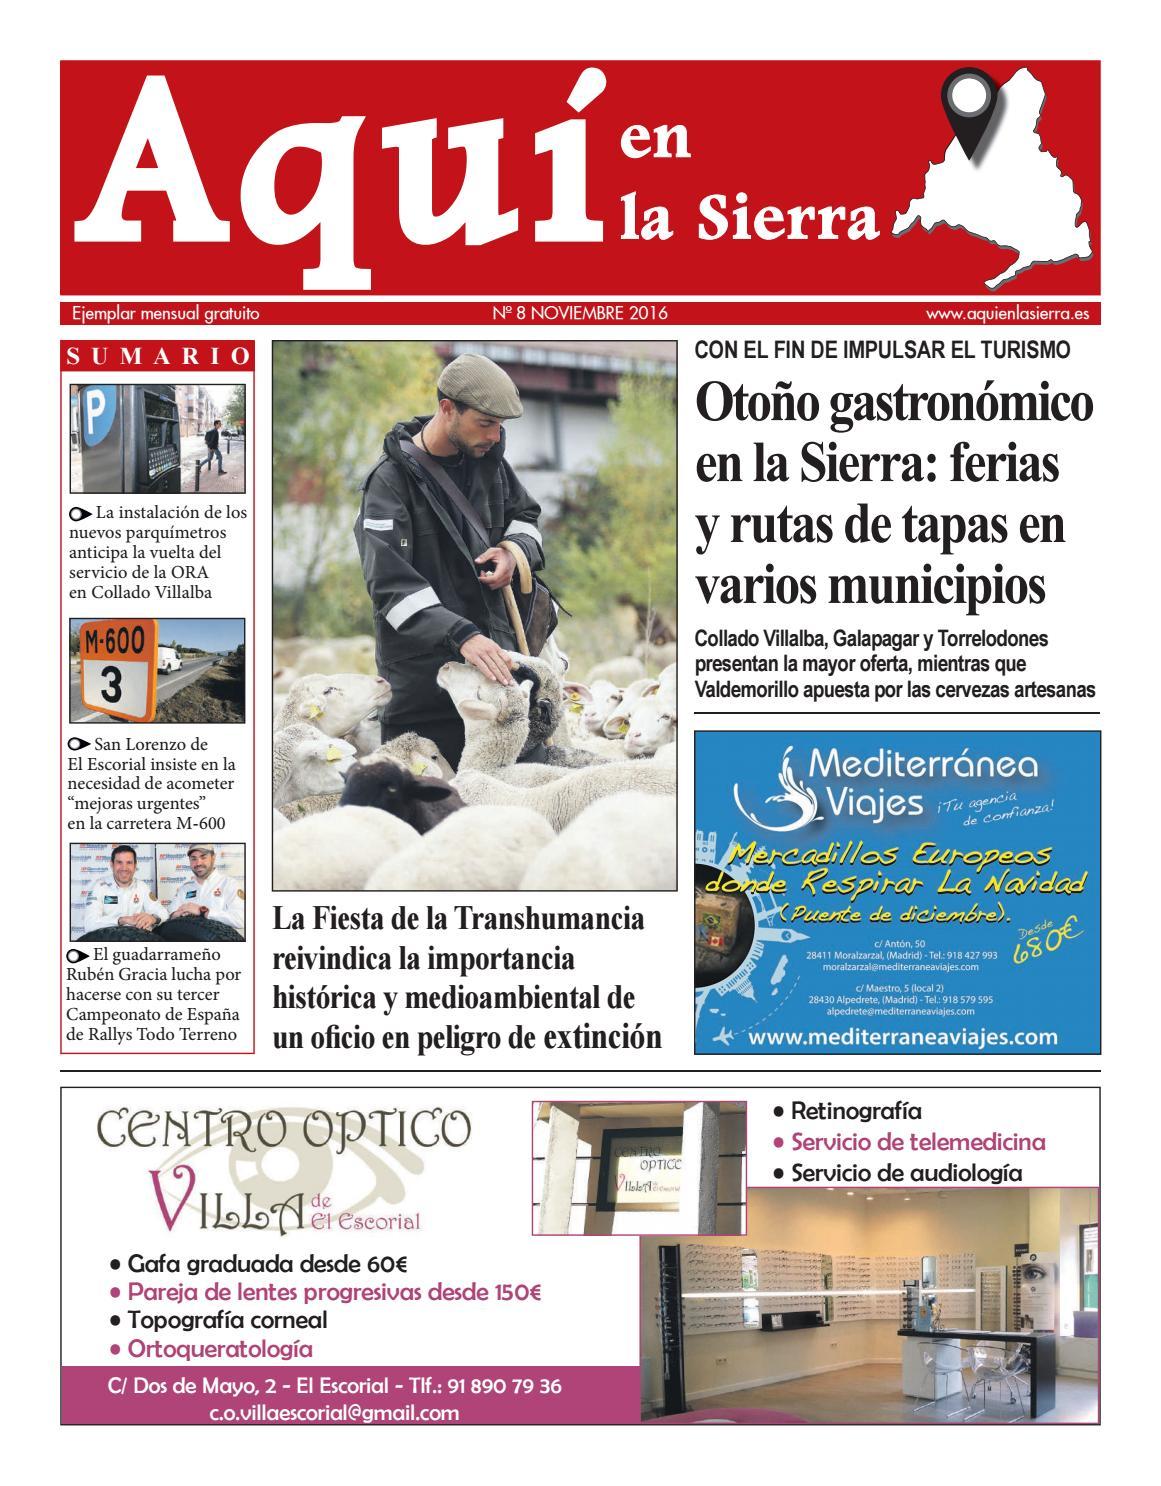 ff17ecb7a5 Aquí en la Sierra - Noviembre 2016 by Aqui en la sierra - issuu